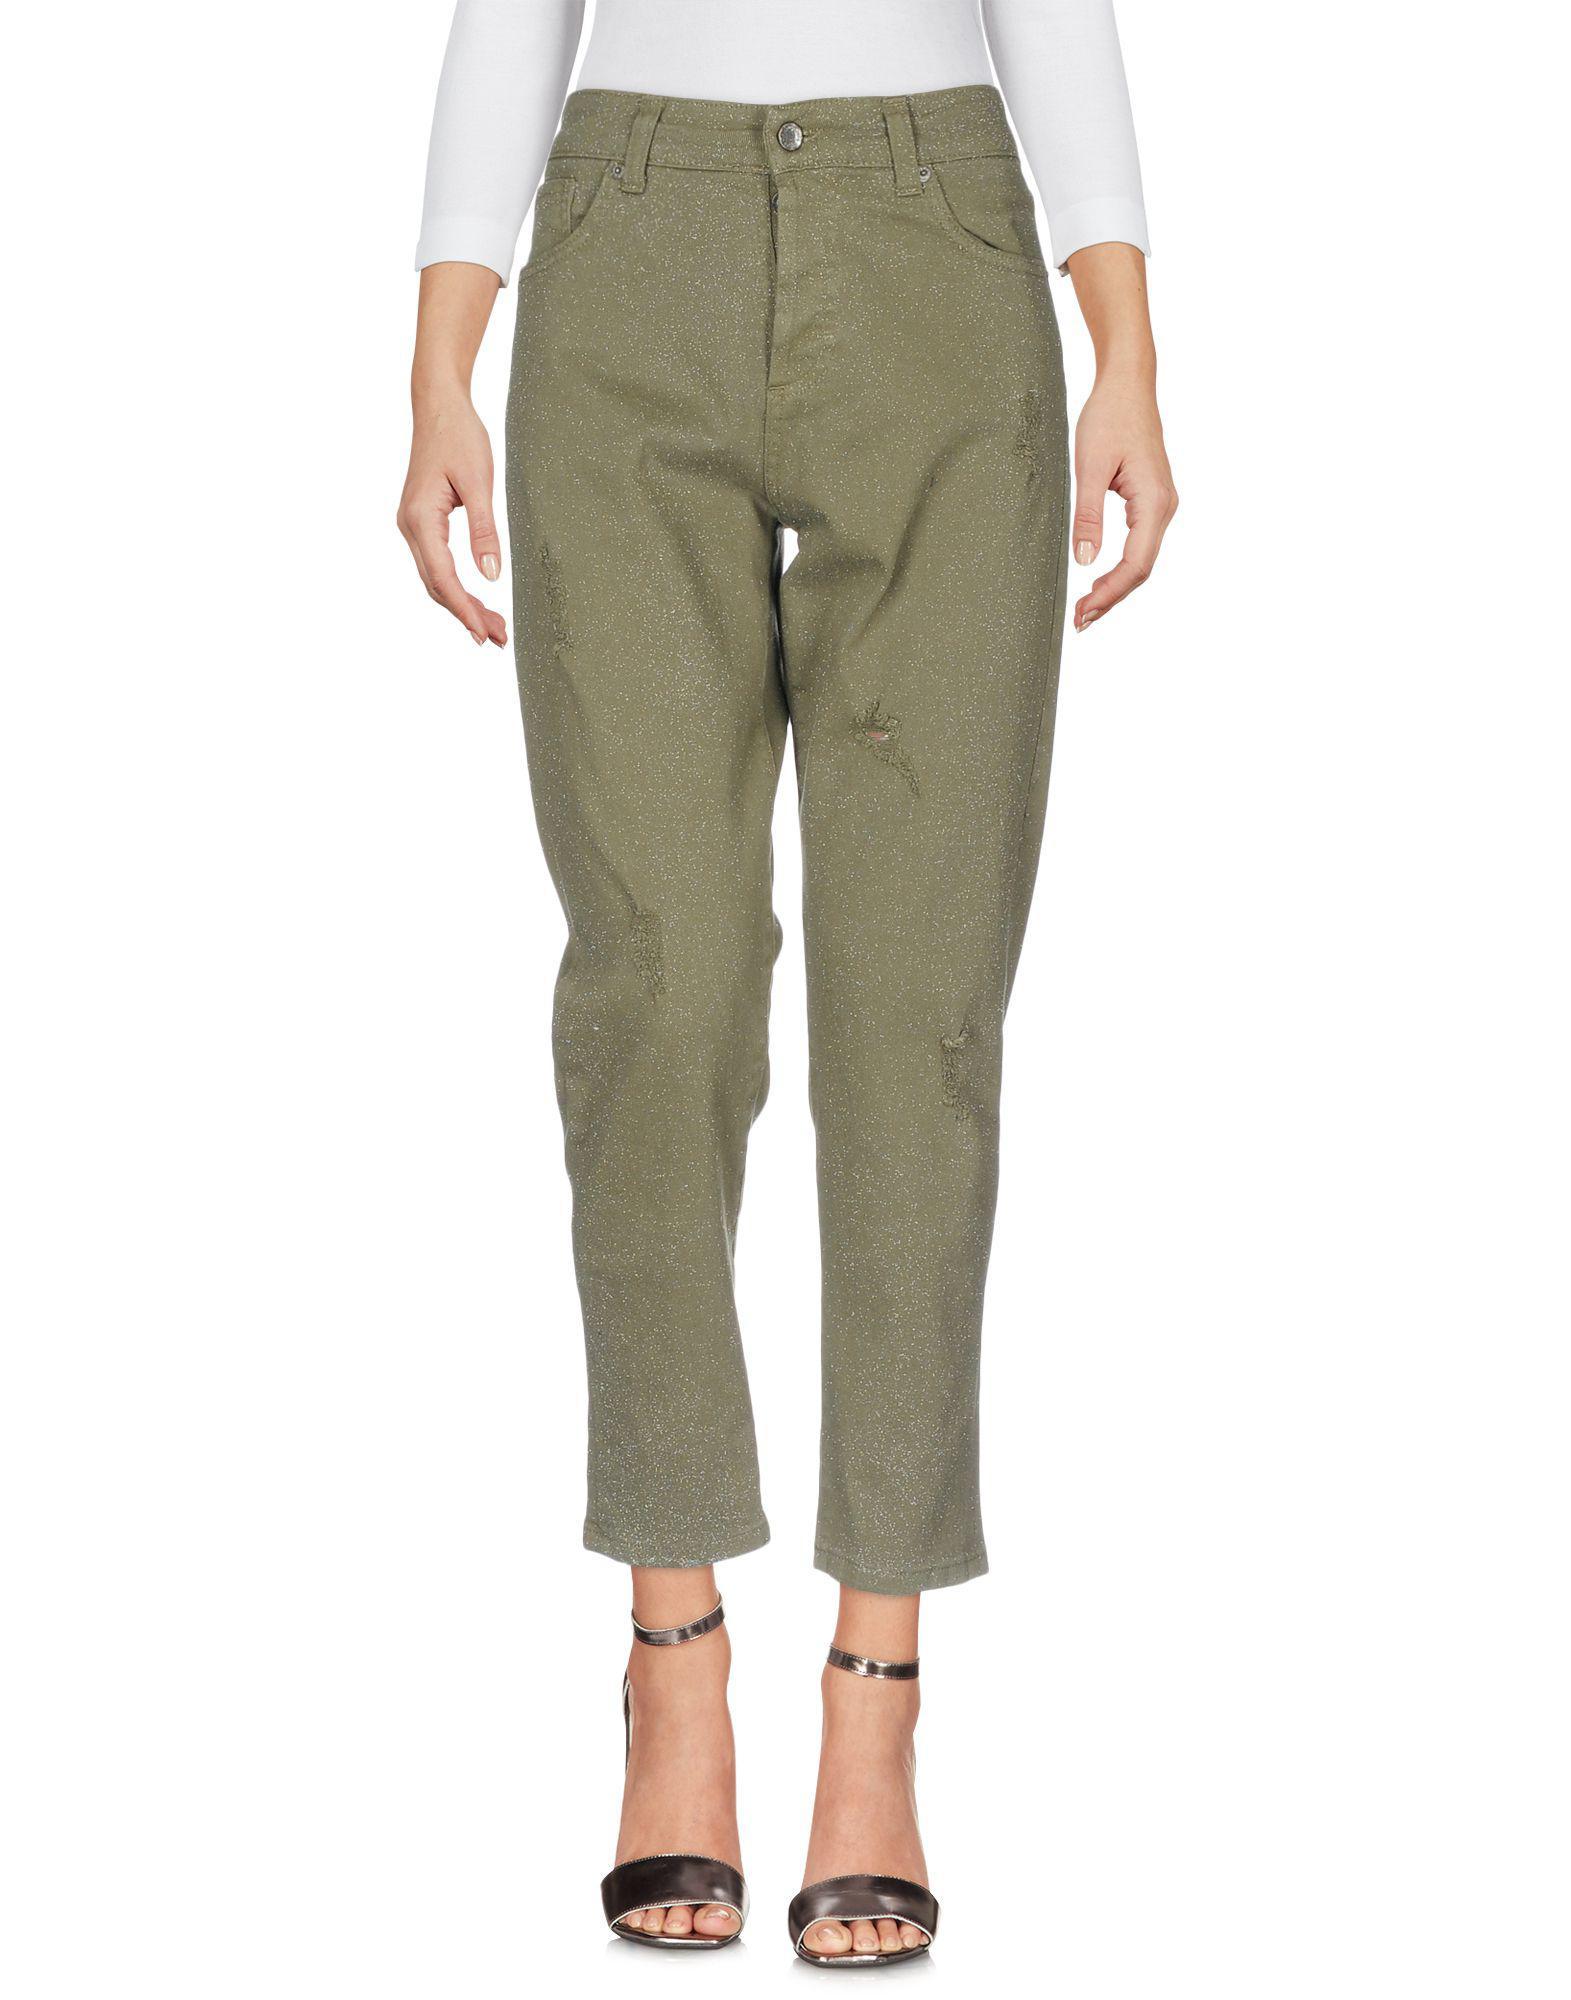 DENIM - Denim trousers Souvenir Manchester Great Sale Cheap Price Cheap Find Great bbHnOg6